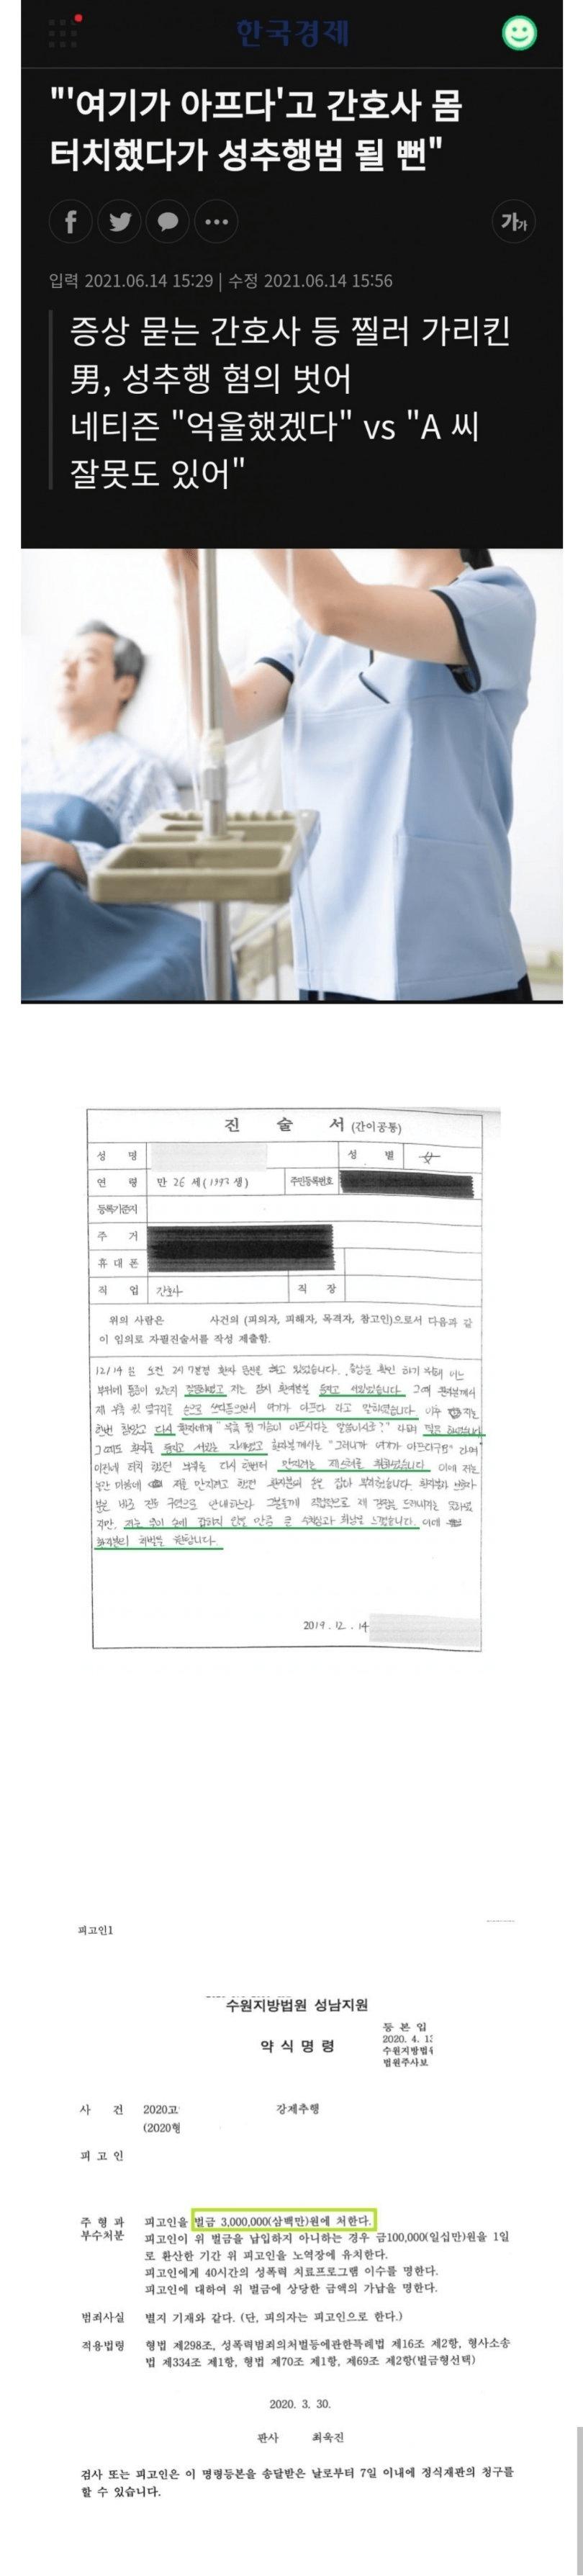 image.png 간호사한테 성추행범으로 누명 쓴 사건